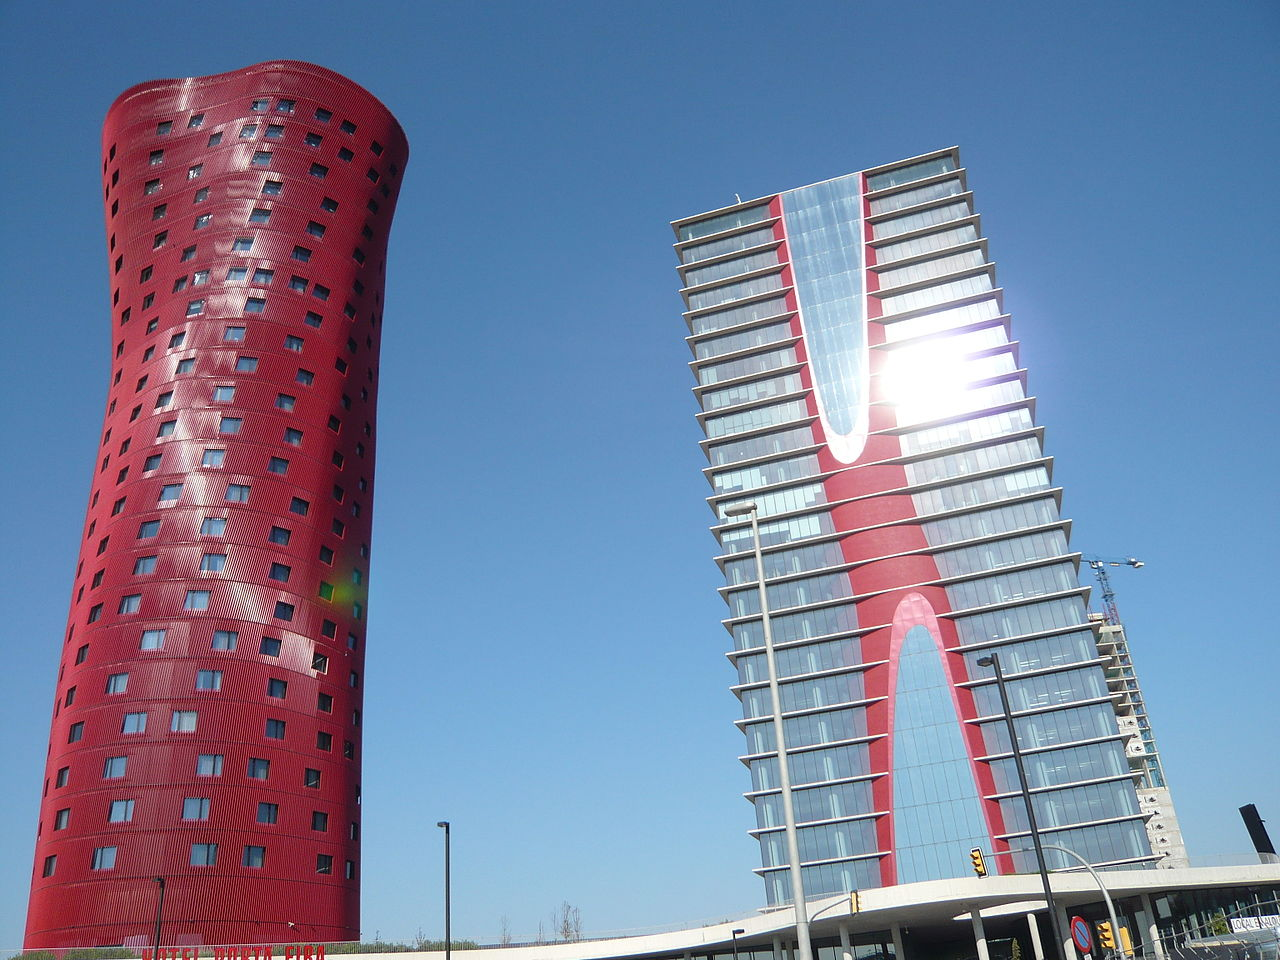 1280px-Barcelona_2010_August_005_Hotel.JPG